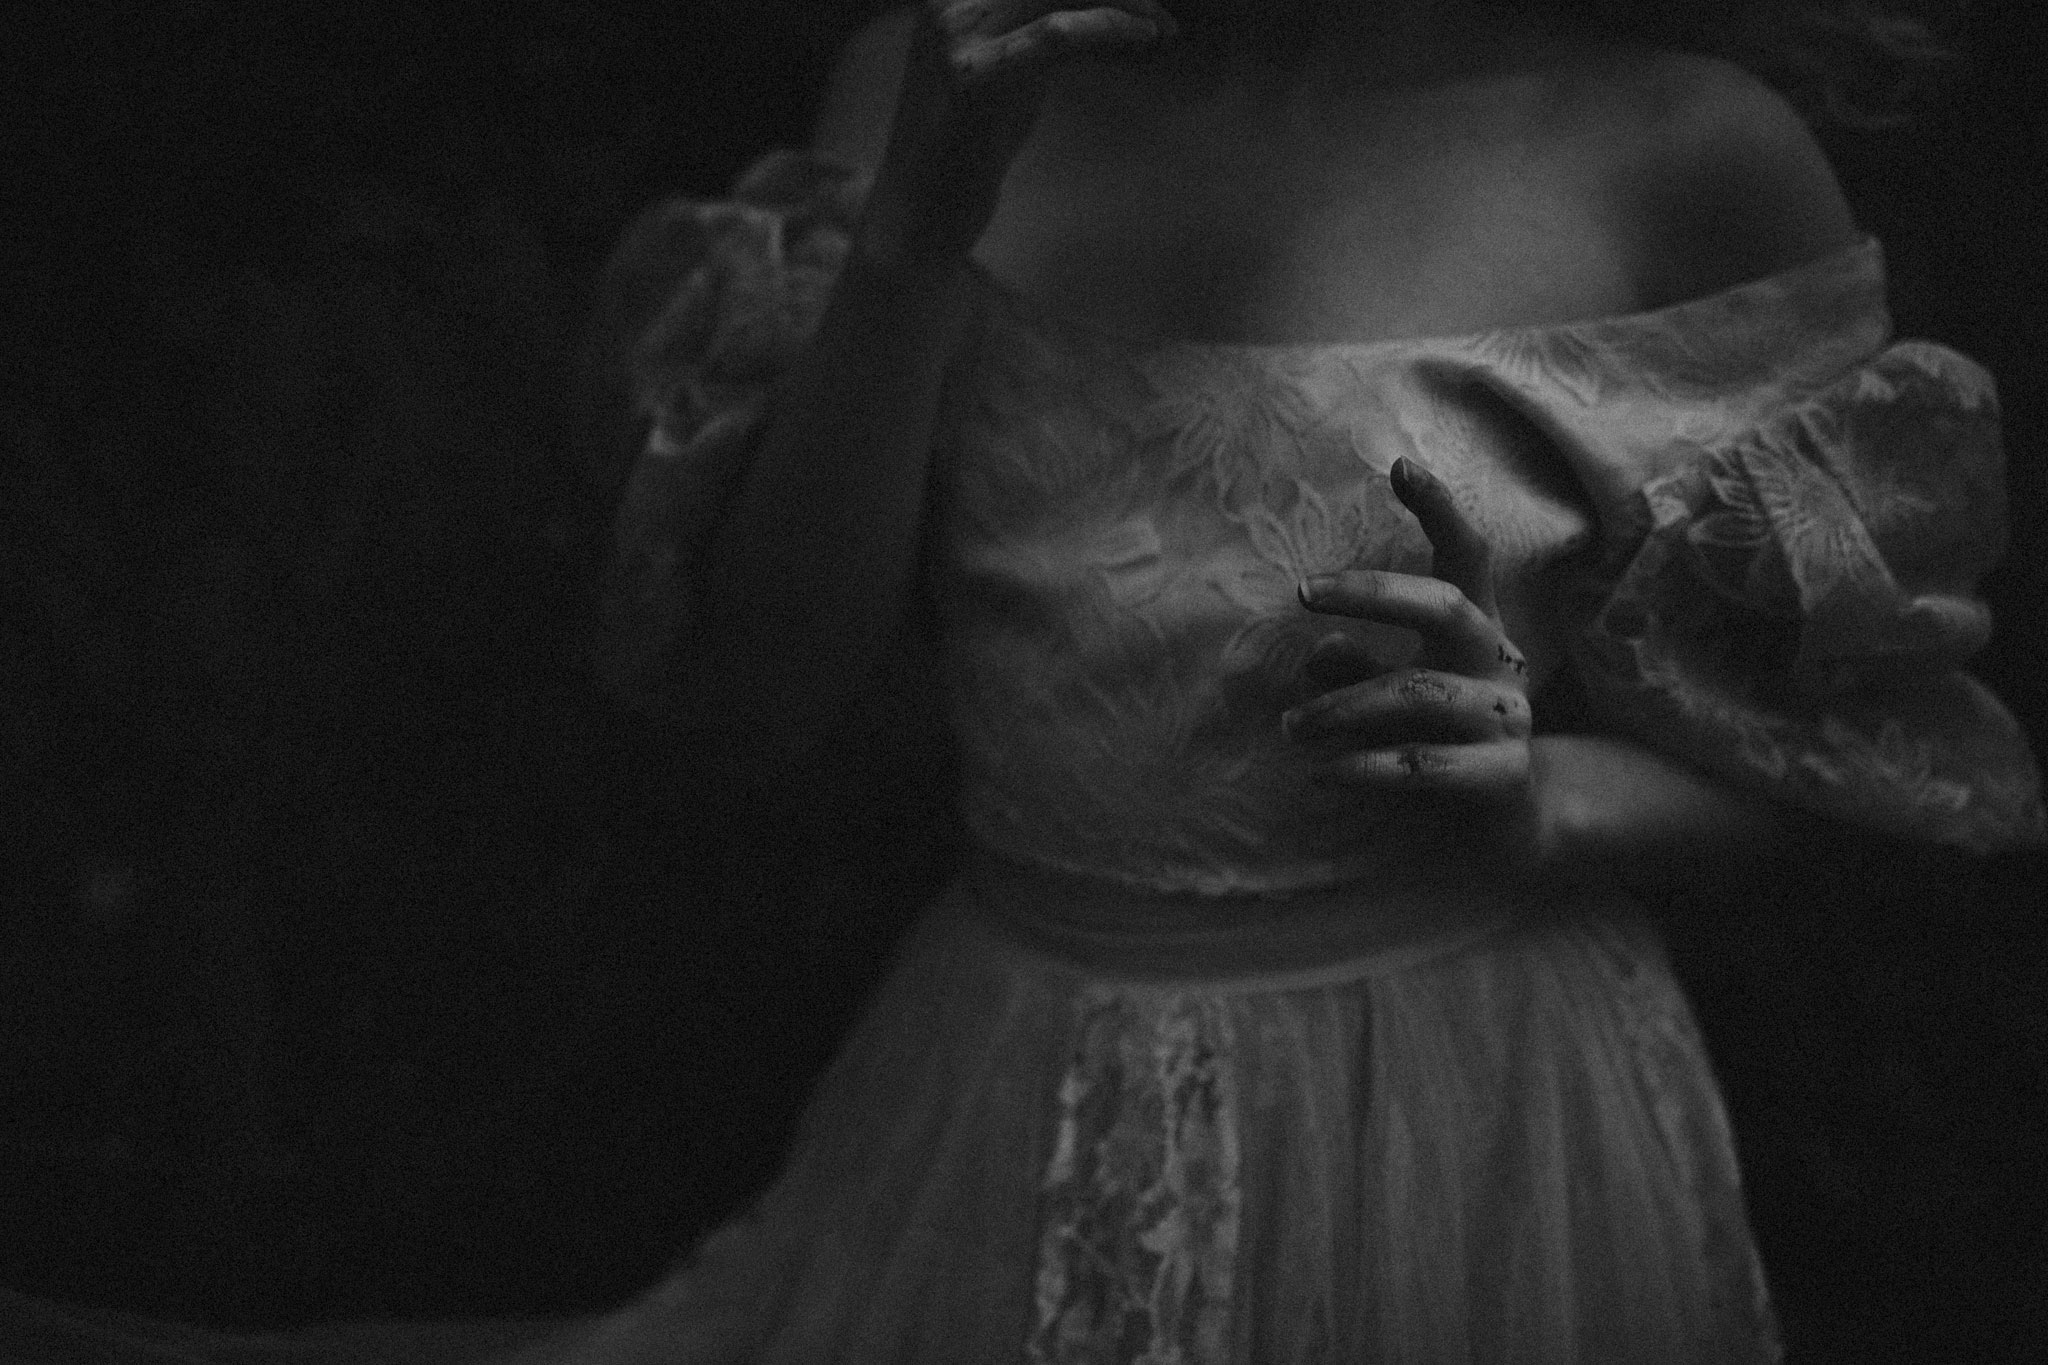 pale-witch-180fb.jpg